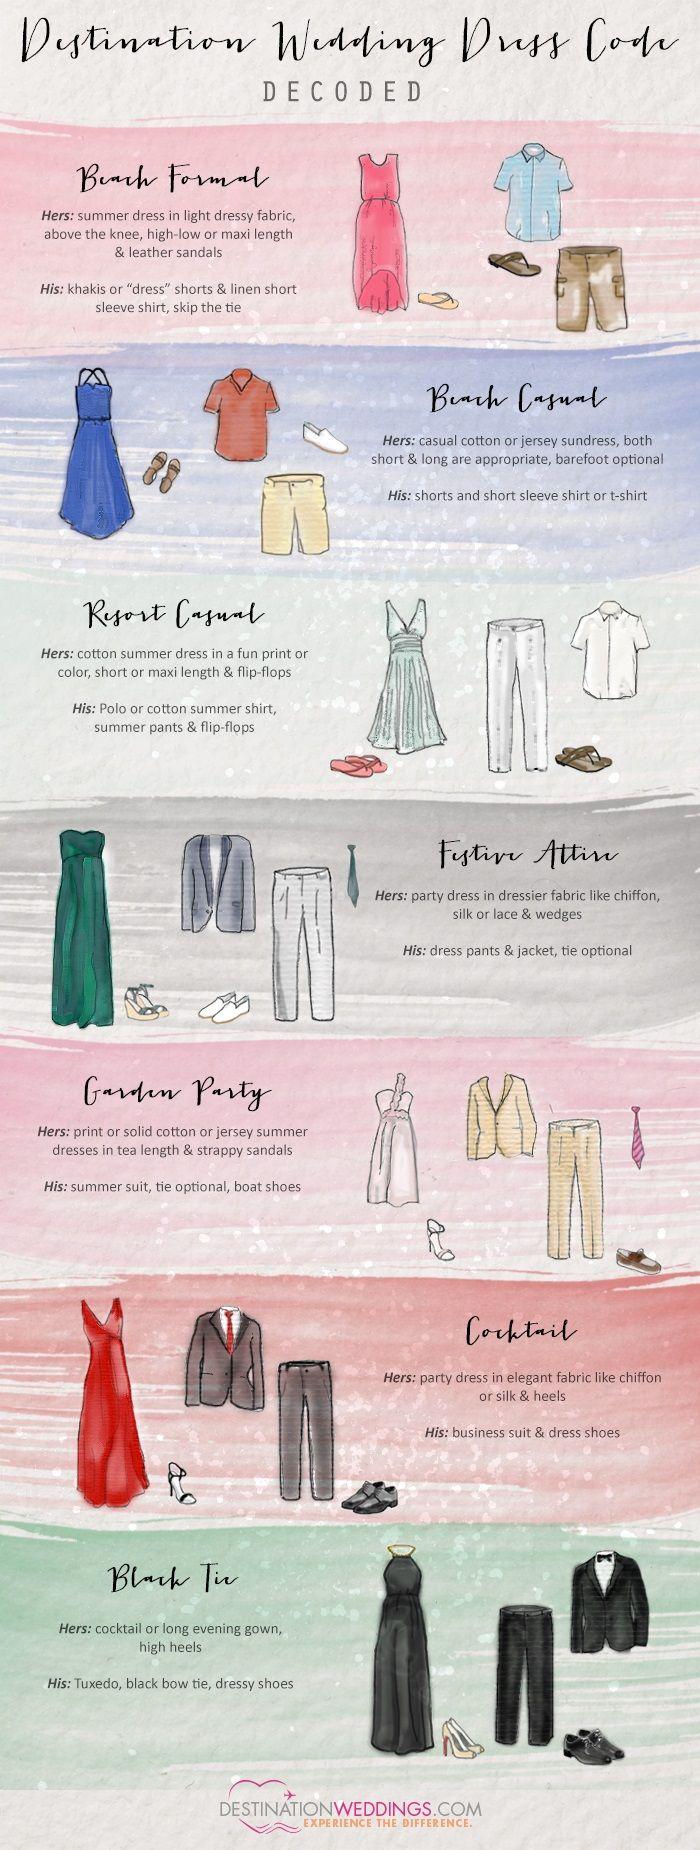 Wedding Dress Codes.Dress Codes For Weddings De Mystified Infographic Fashion